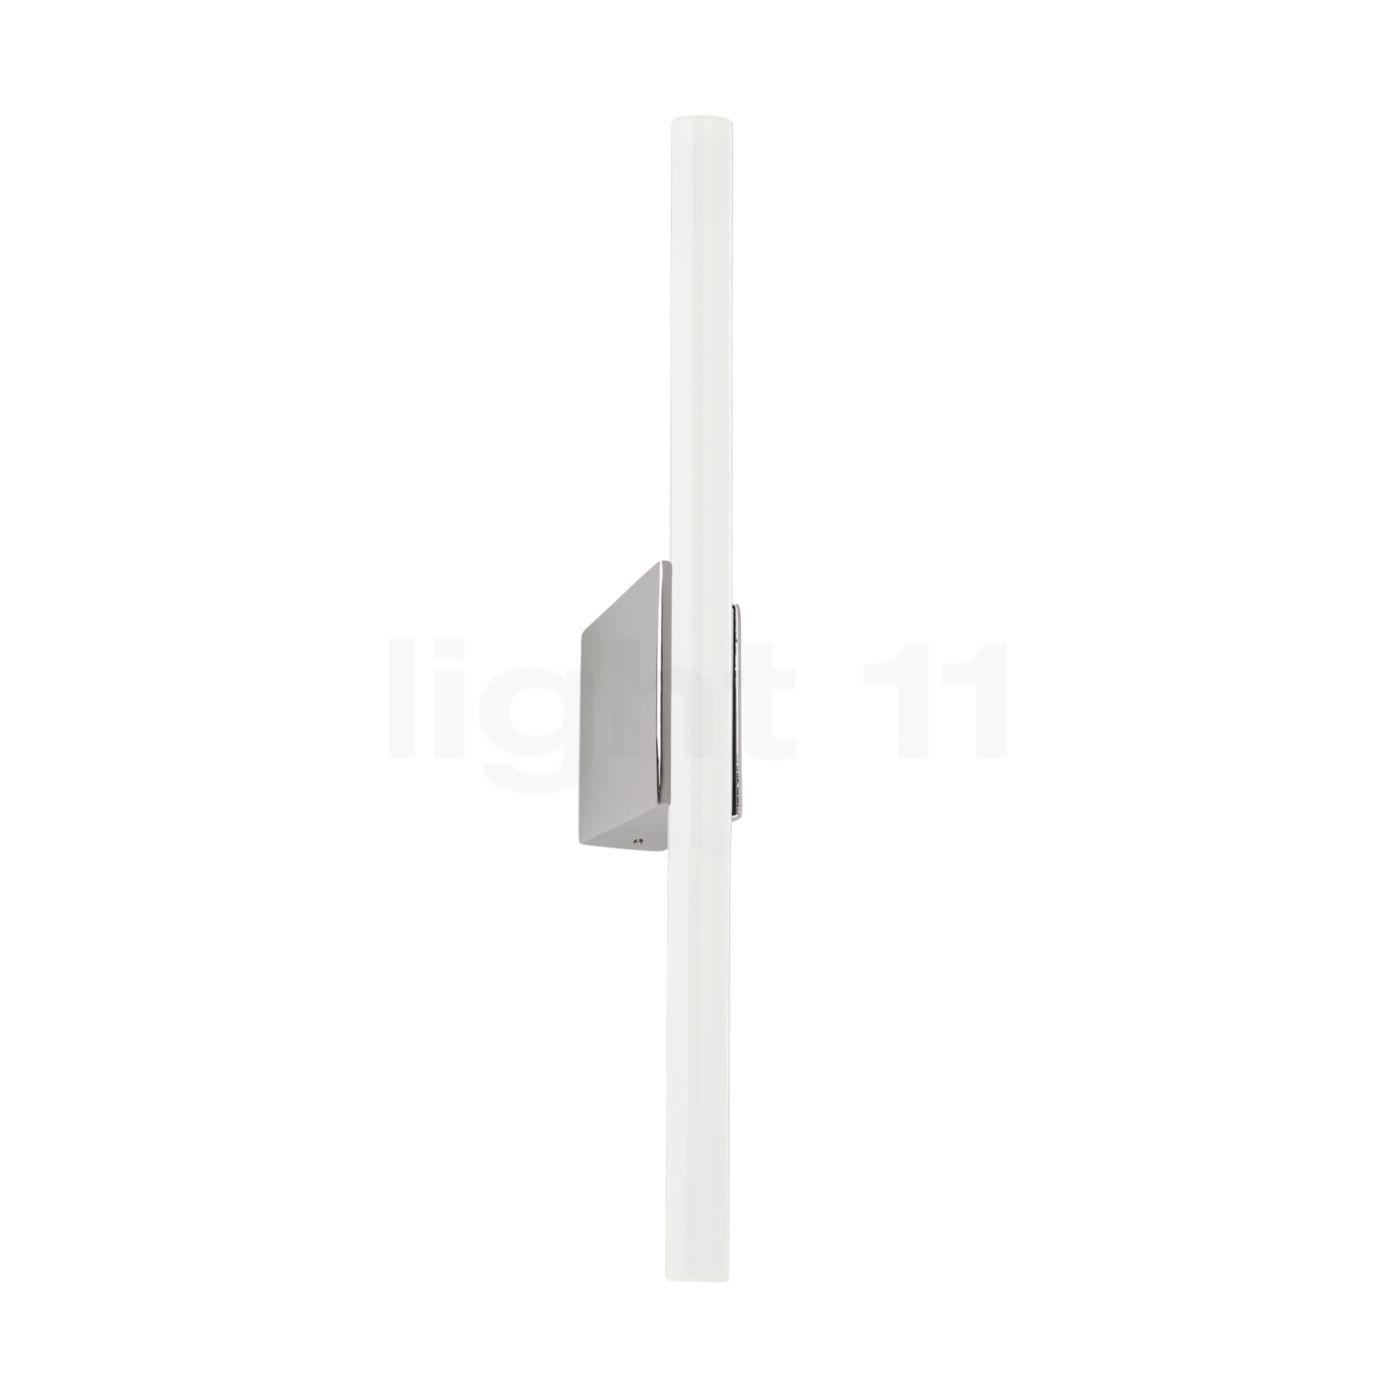 Mawa Design mawa linestra 7 wall mounted light buy at light11 eu